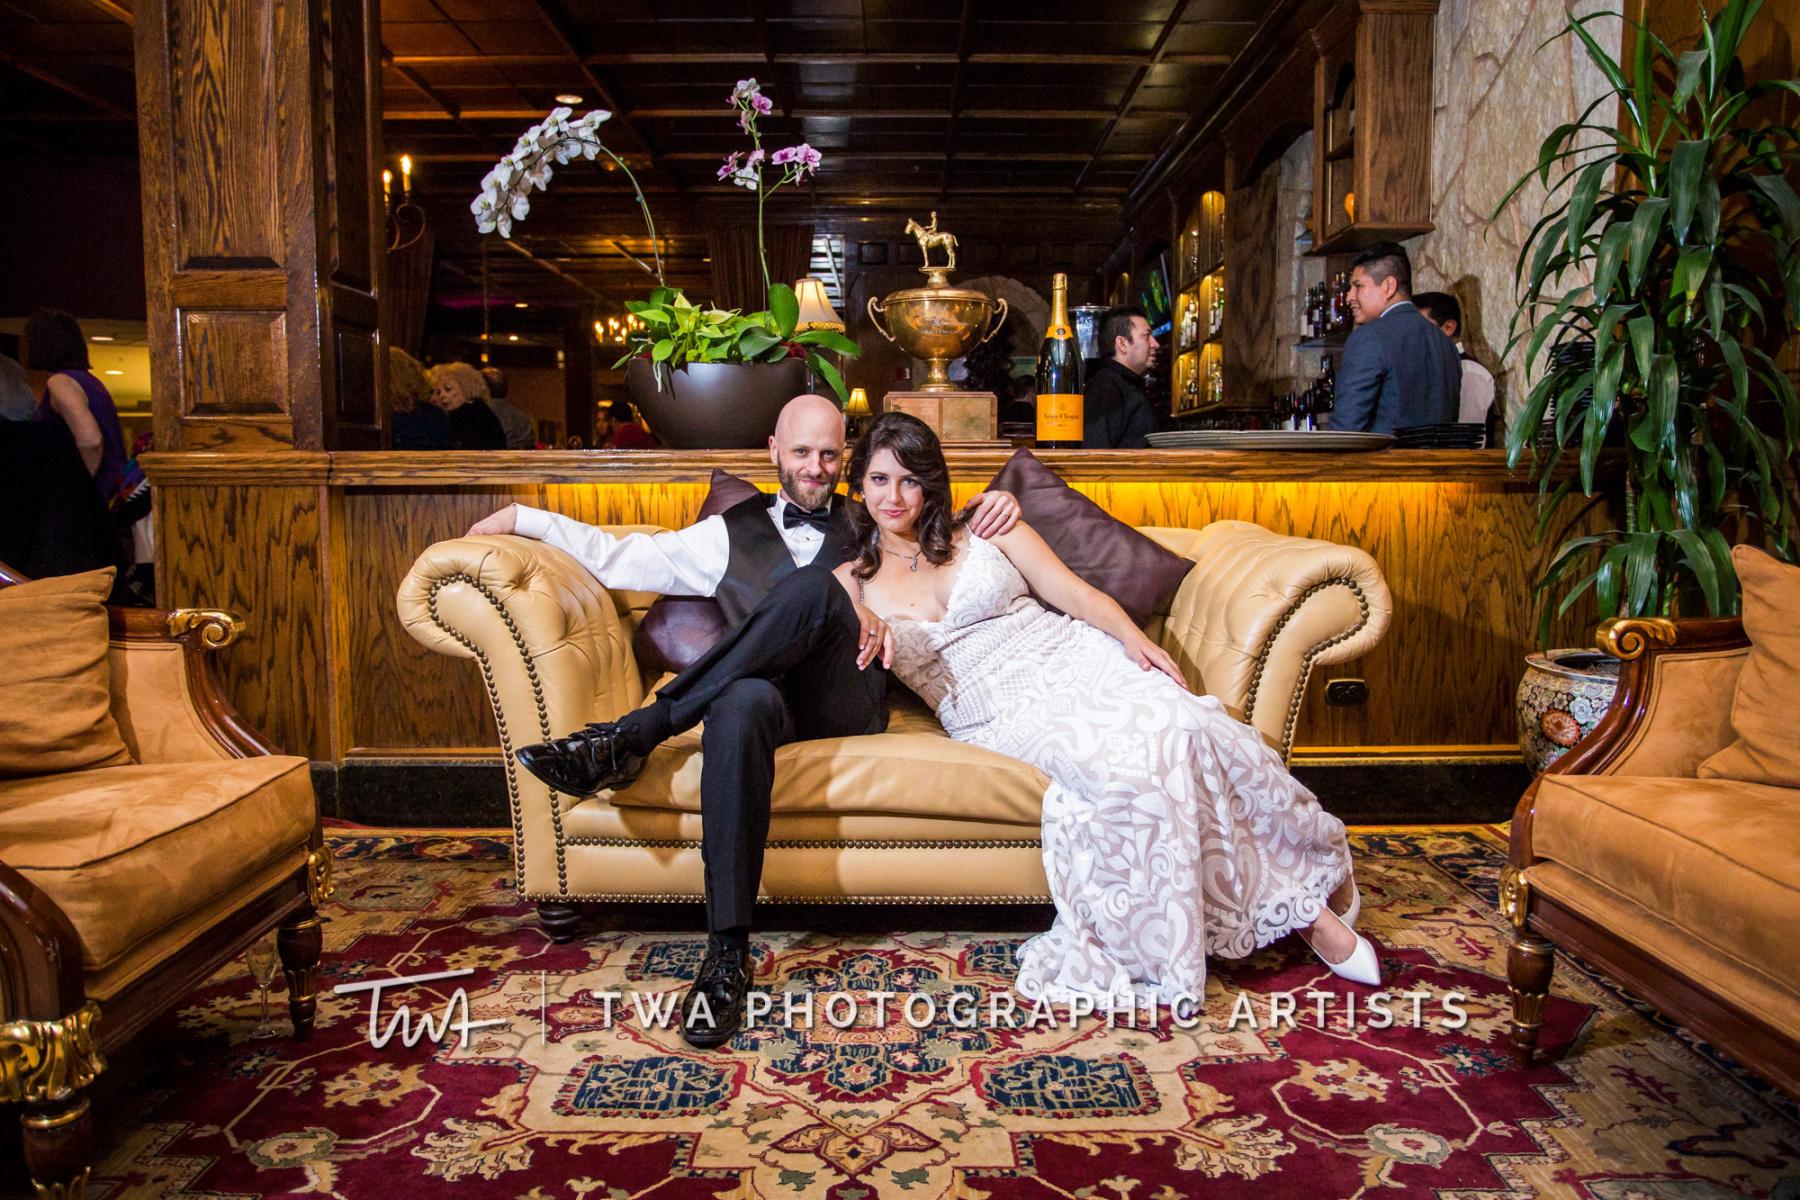 Chicago-Wedding-Photographer-TWA-Photographic-Artists-Drake-Oak-Brook_Monteagudo_Crohn_JM_CL-0788